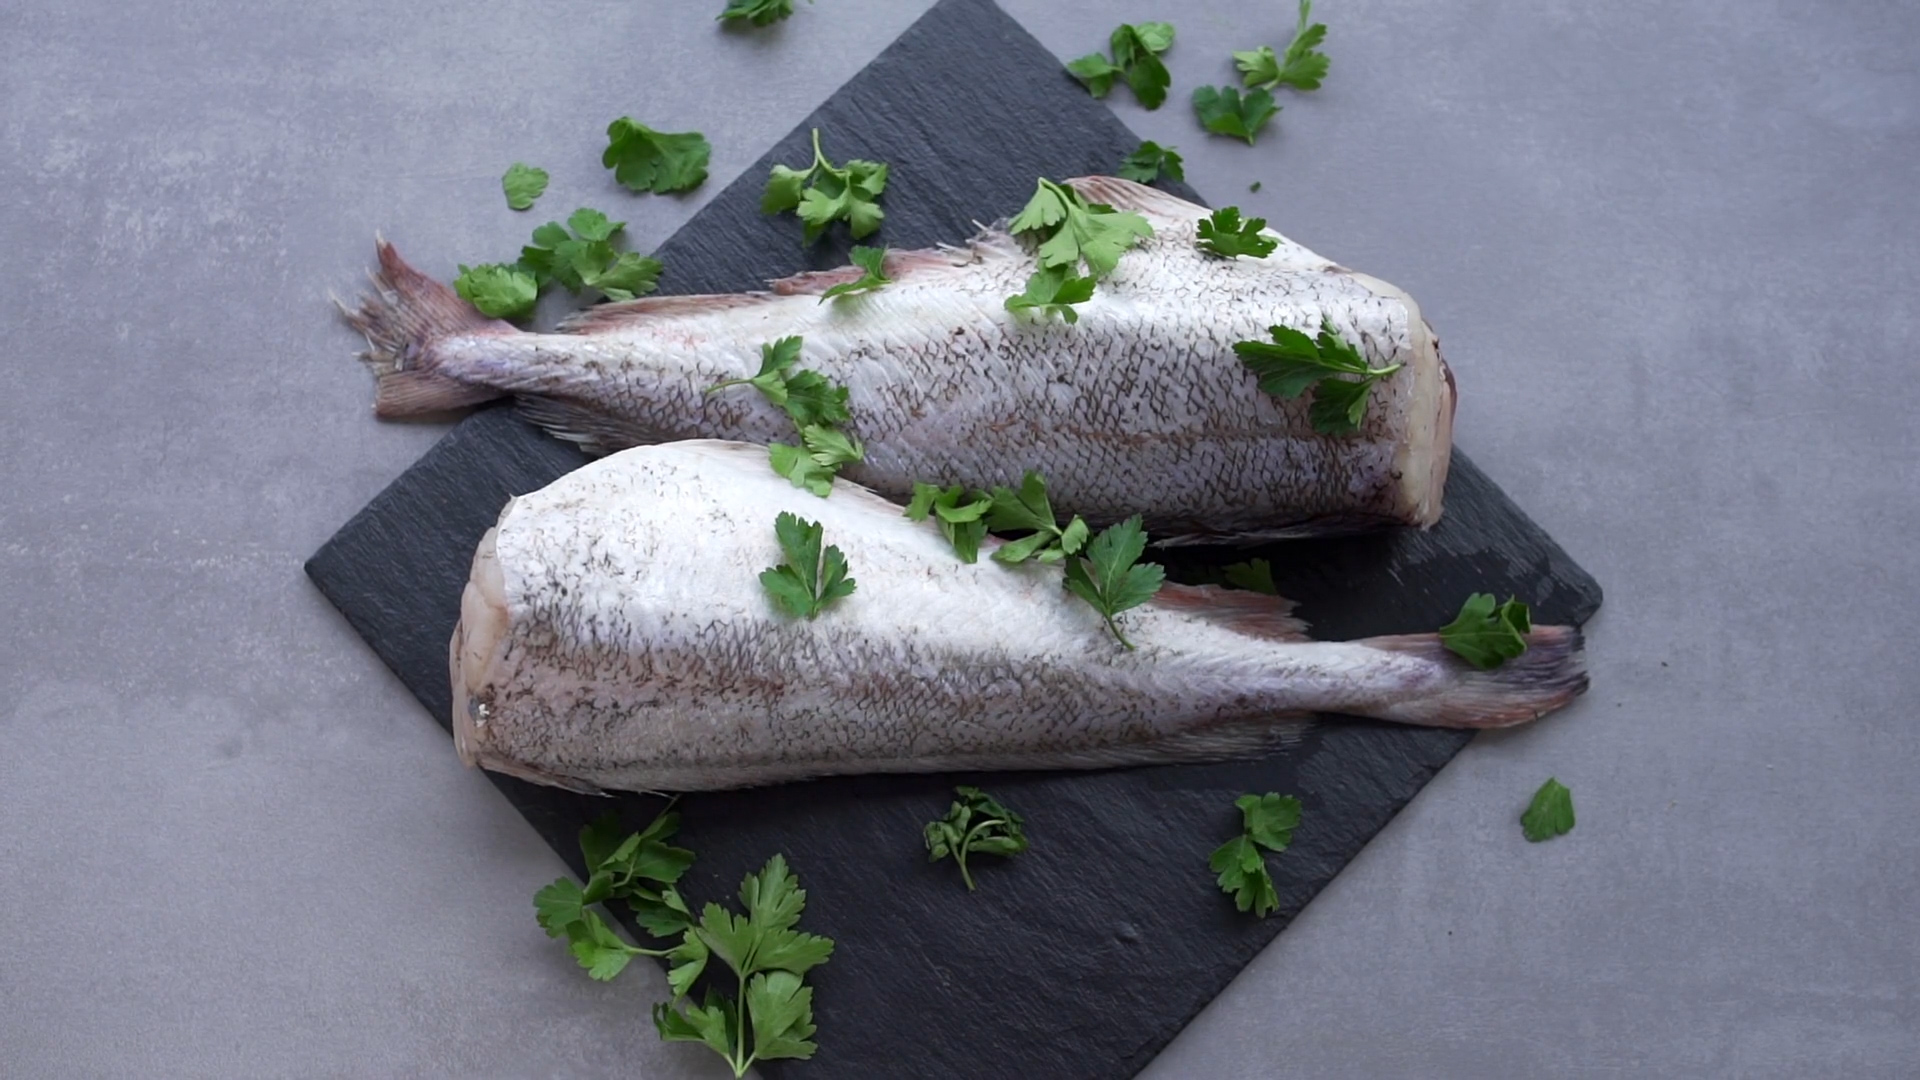 Ryby bogate w kwasy omega-3